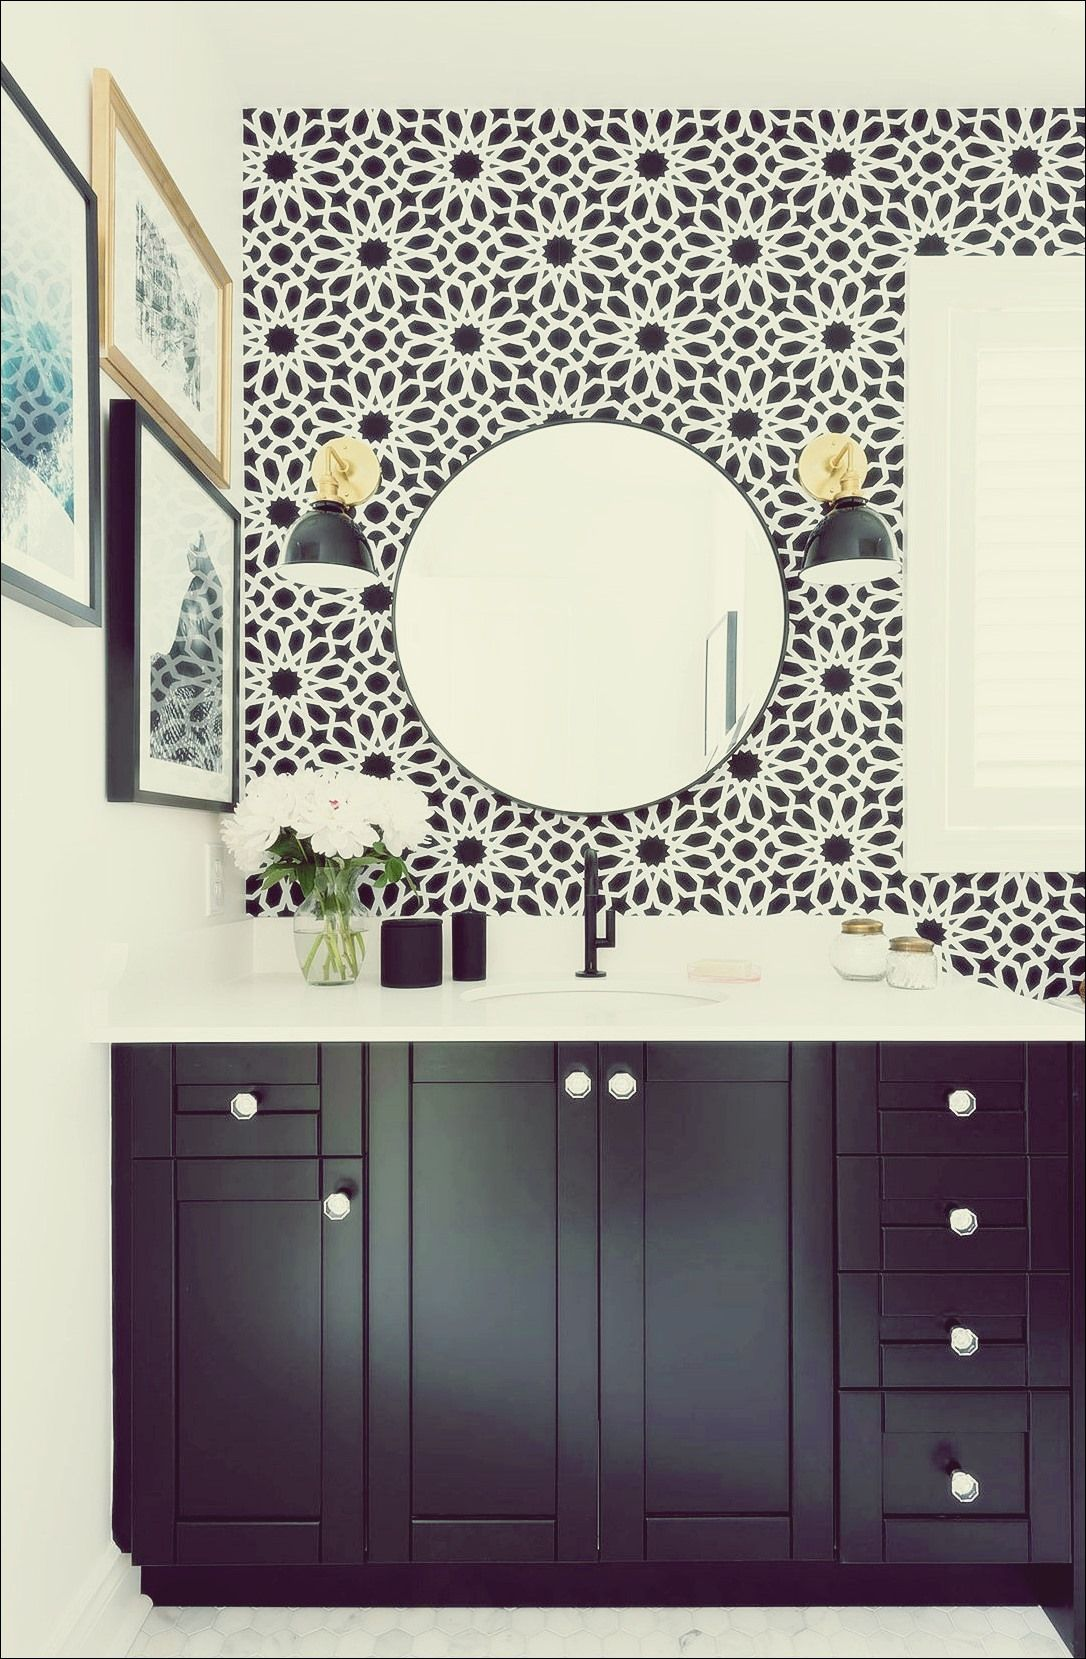 10 Tipps Fur Rocking Badezimmer Wallpaper Badezimmer